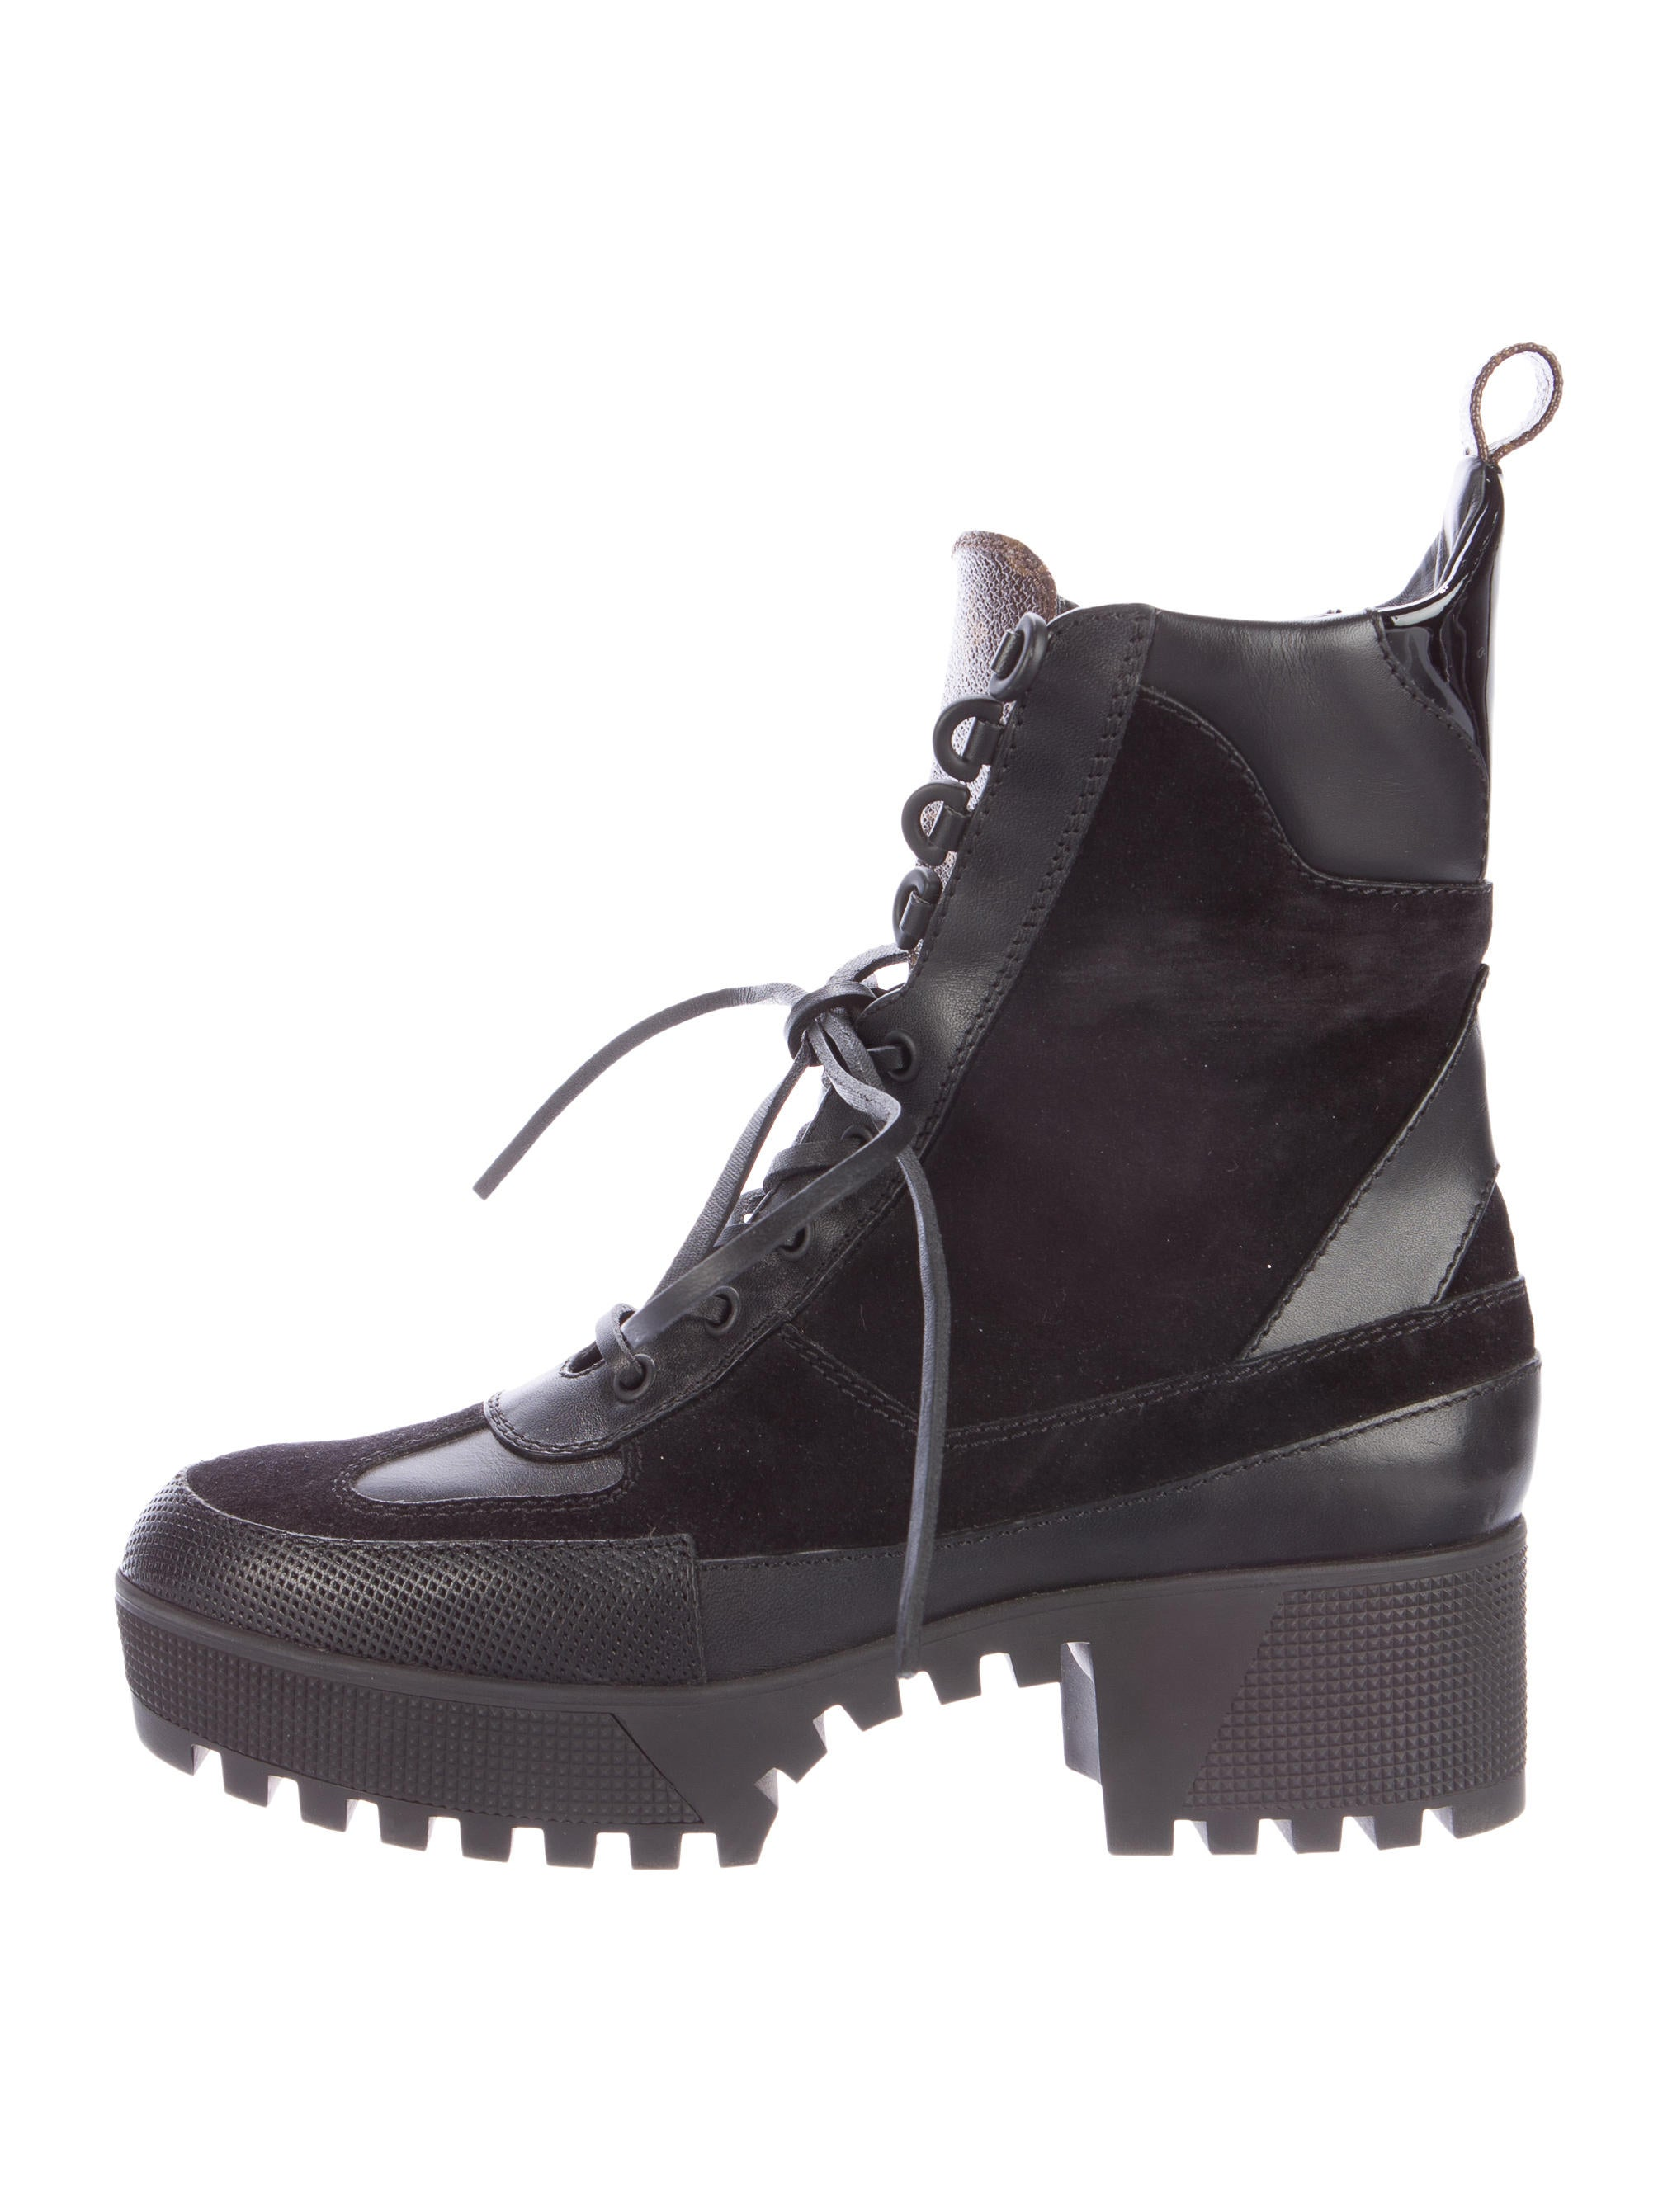 875cda4227ef Louis Vuitton 2016 Laureate Platform Desert Boots - Shoes - LOU90386 ...